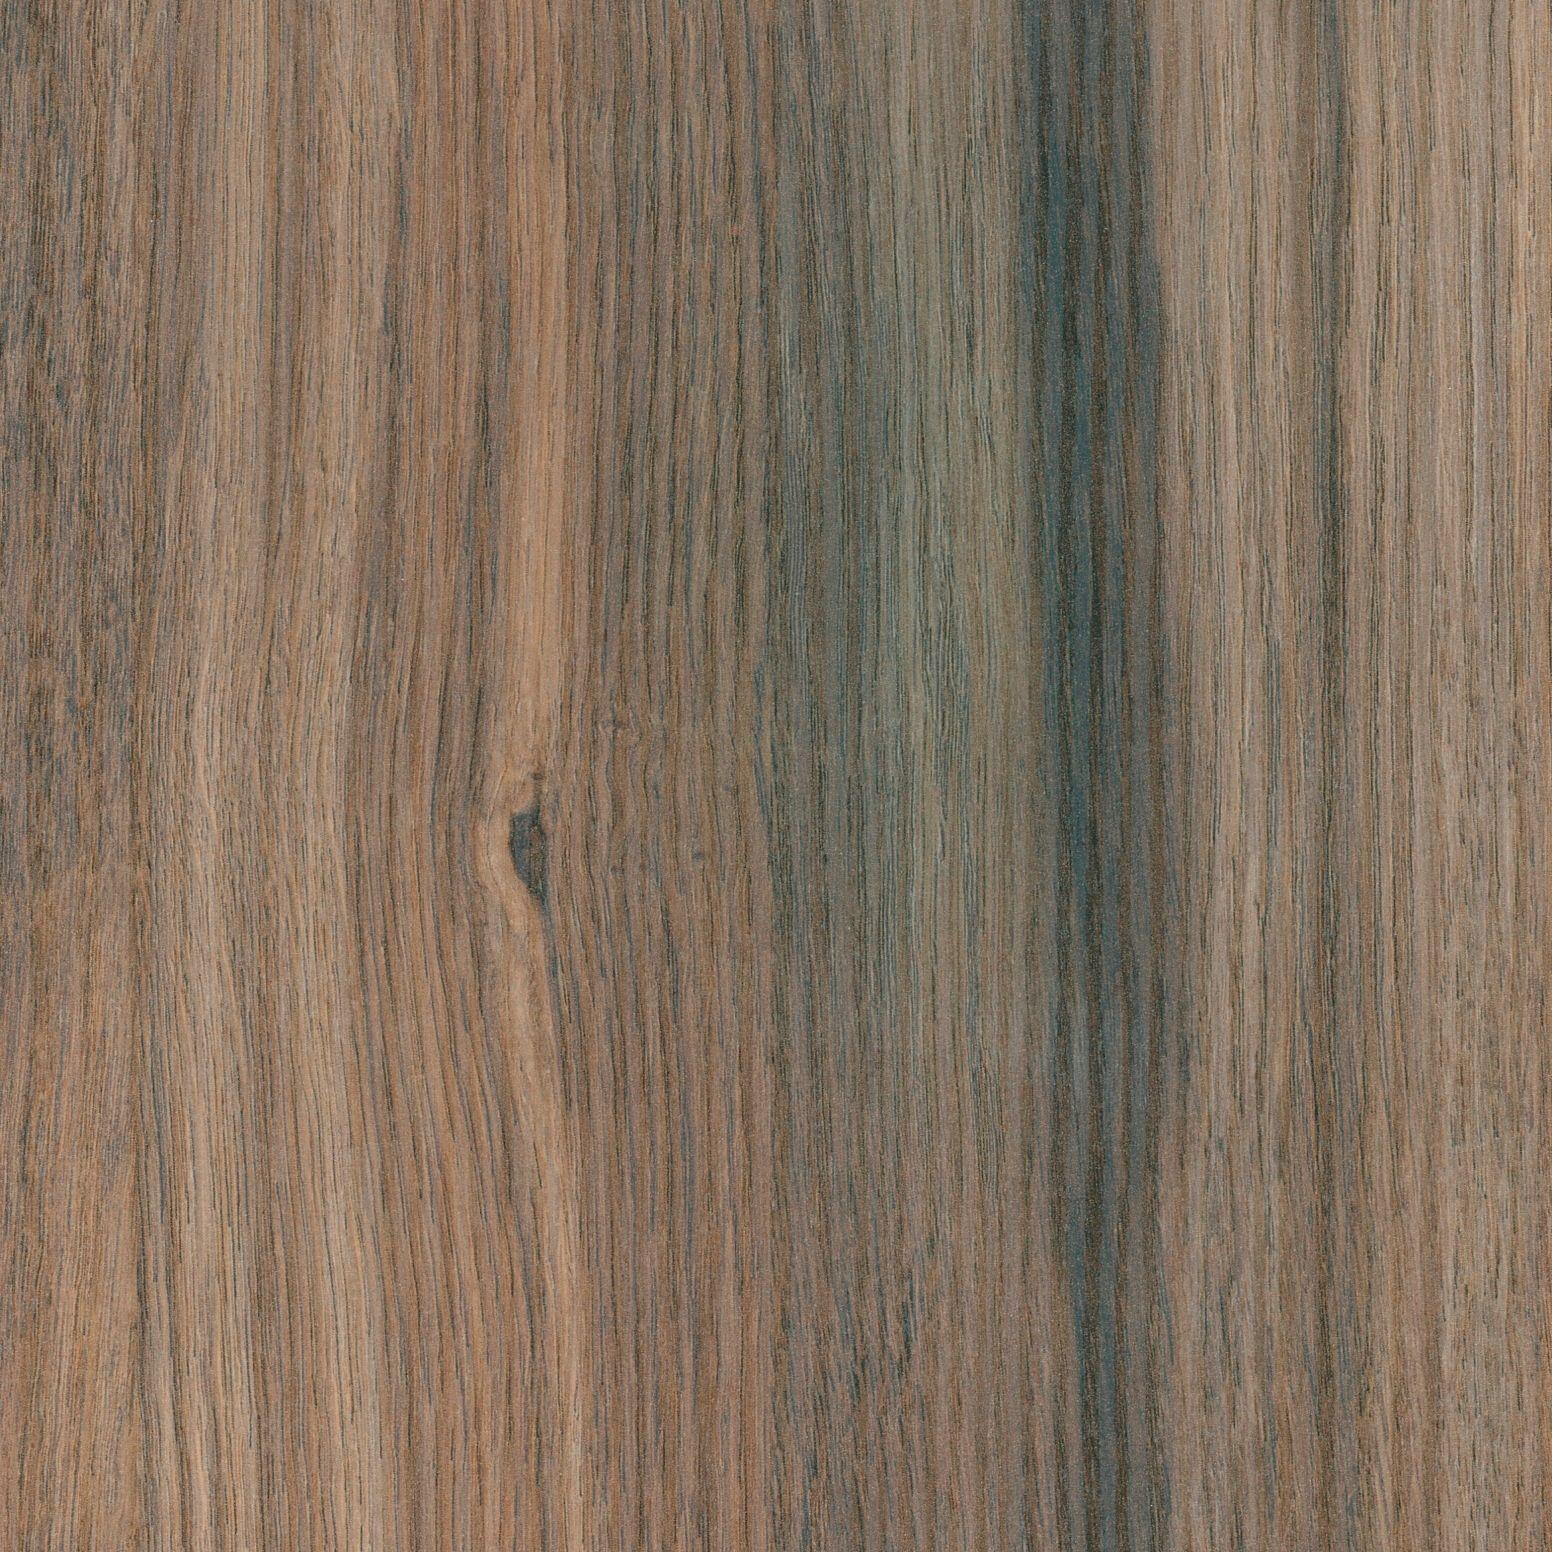 12mm Colorado Oak Mdf Laminate Upstand 6mm Post Form Departments Diy At B Q Worktop Edging Laminate Splashback